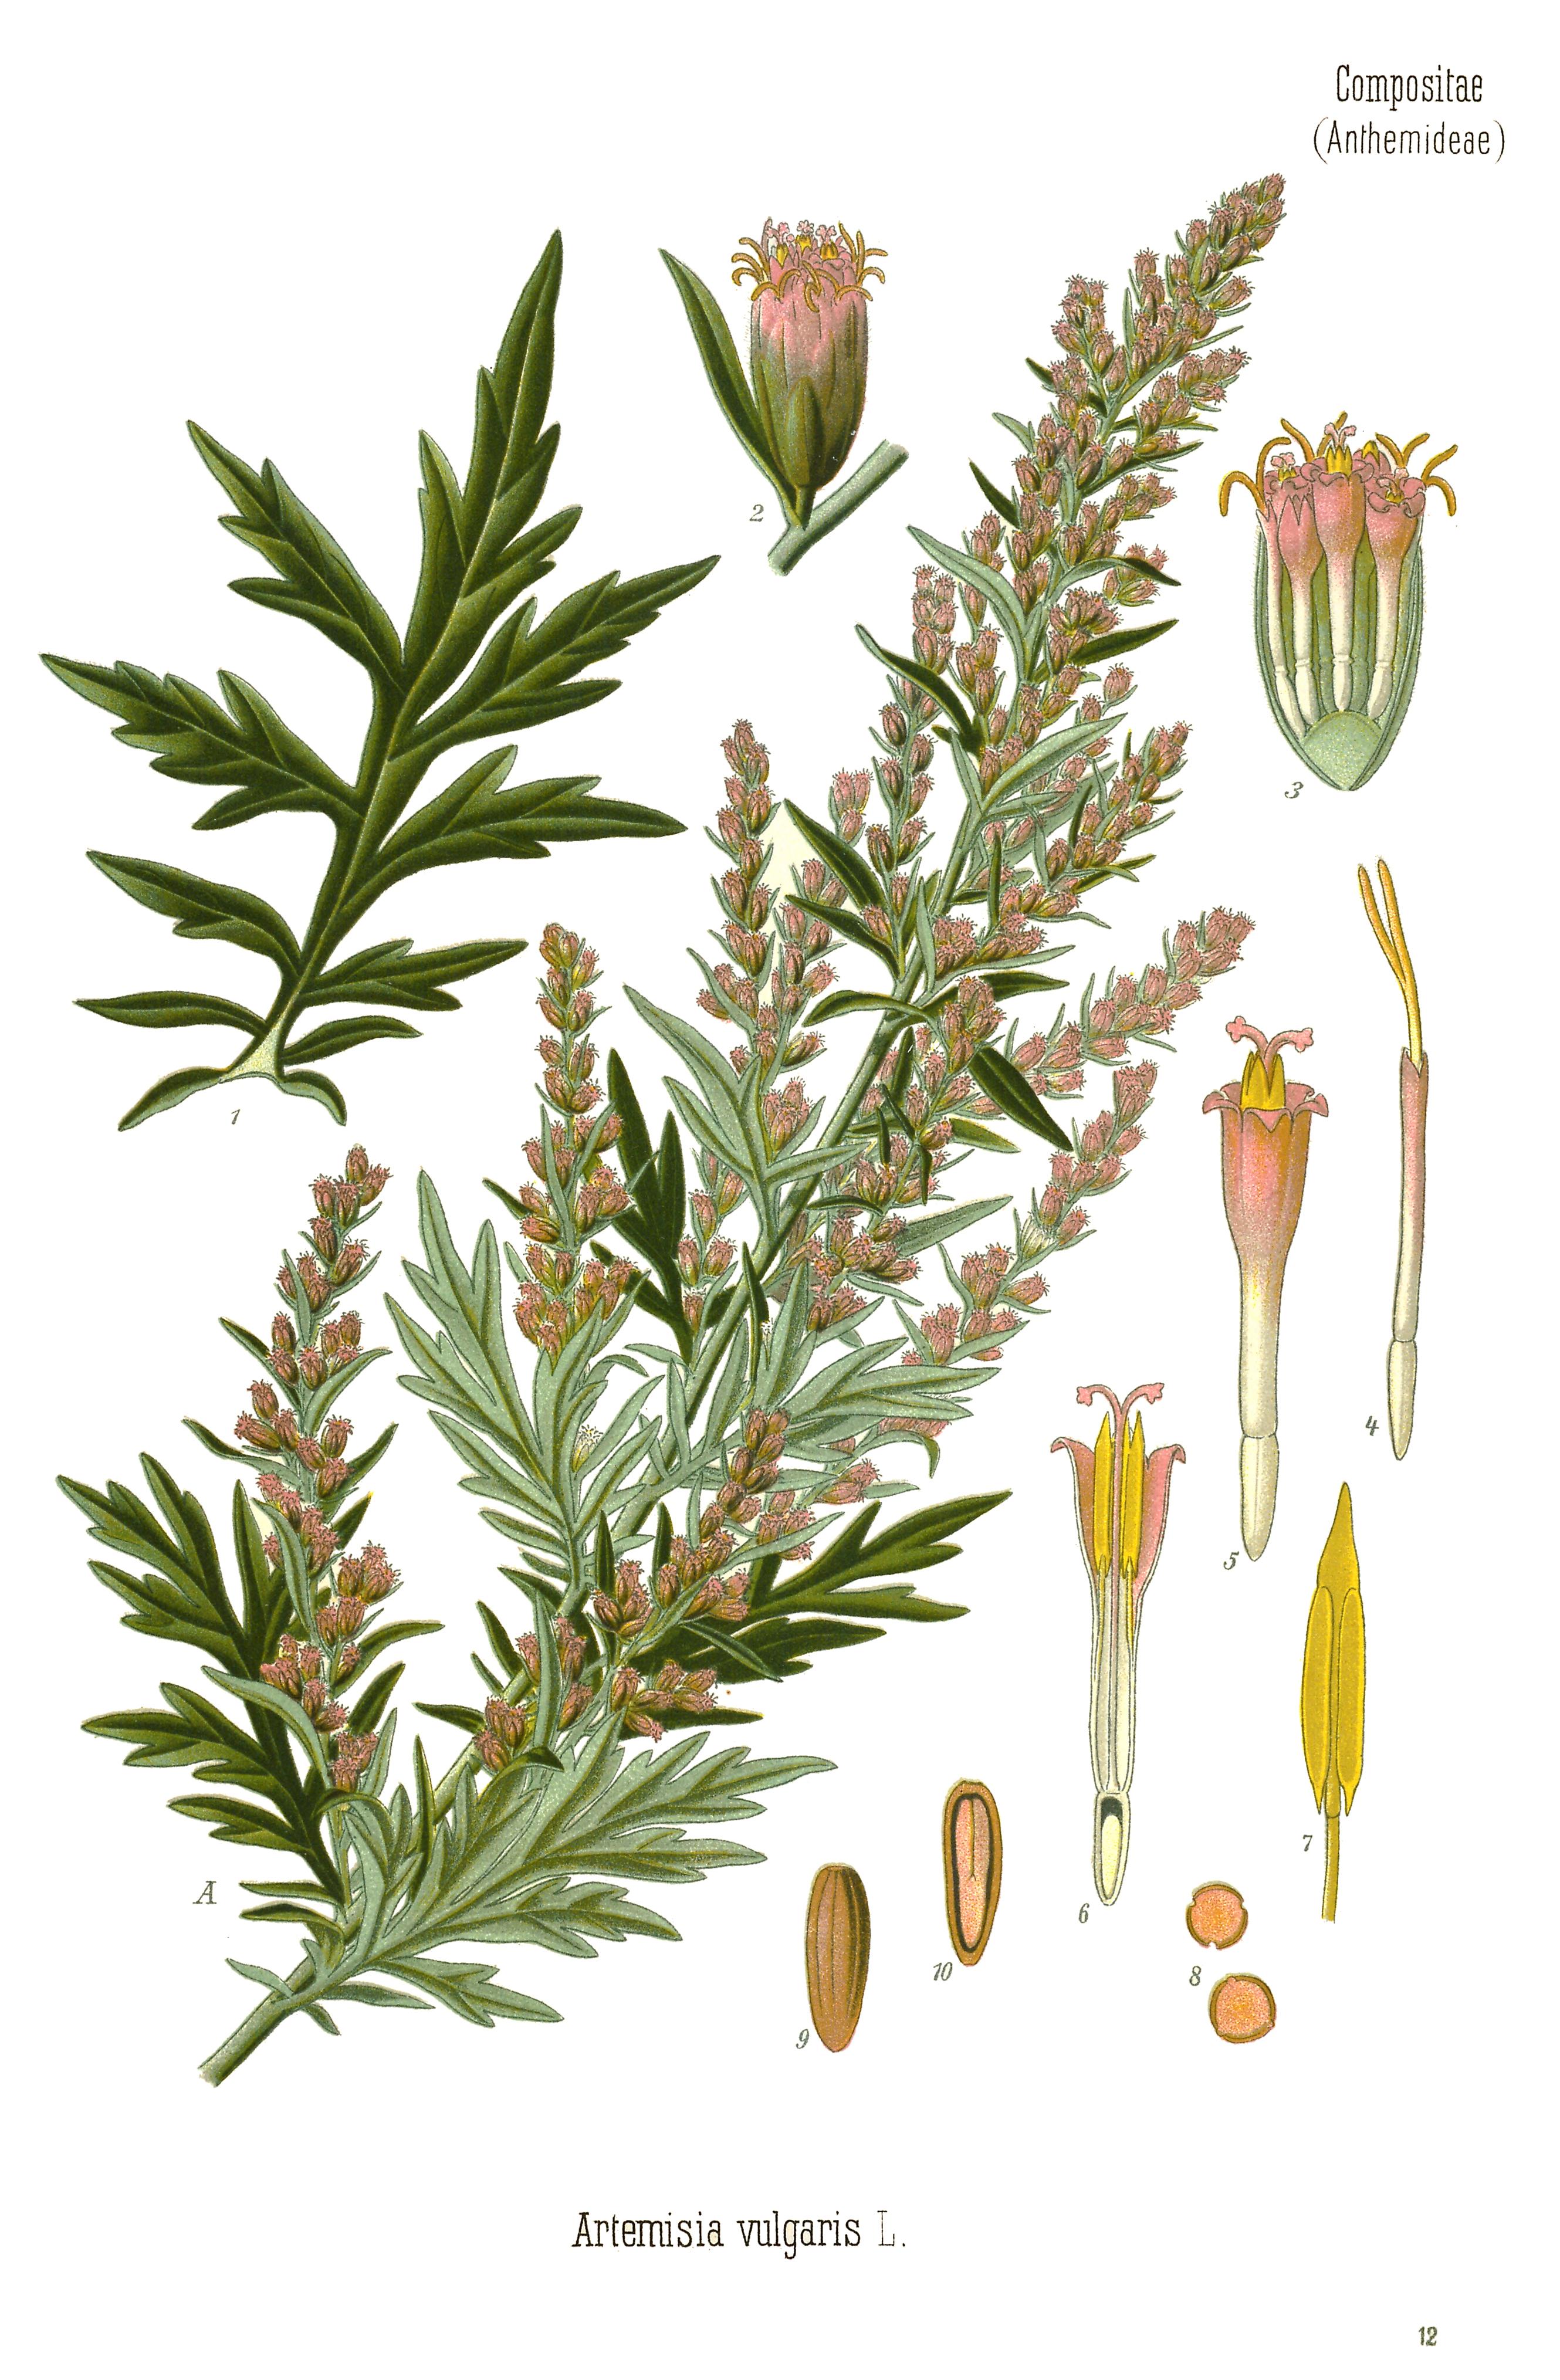 File:Artemisia vulgaris - Köhlers Medizinalpflanzen, Band 3, 1898 ...